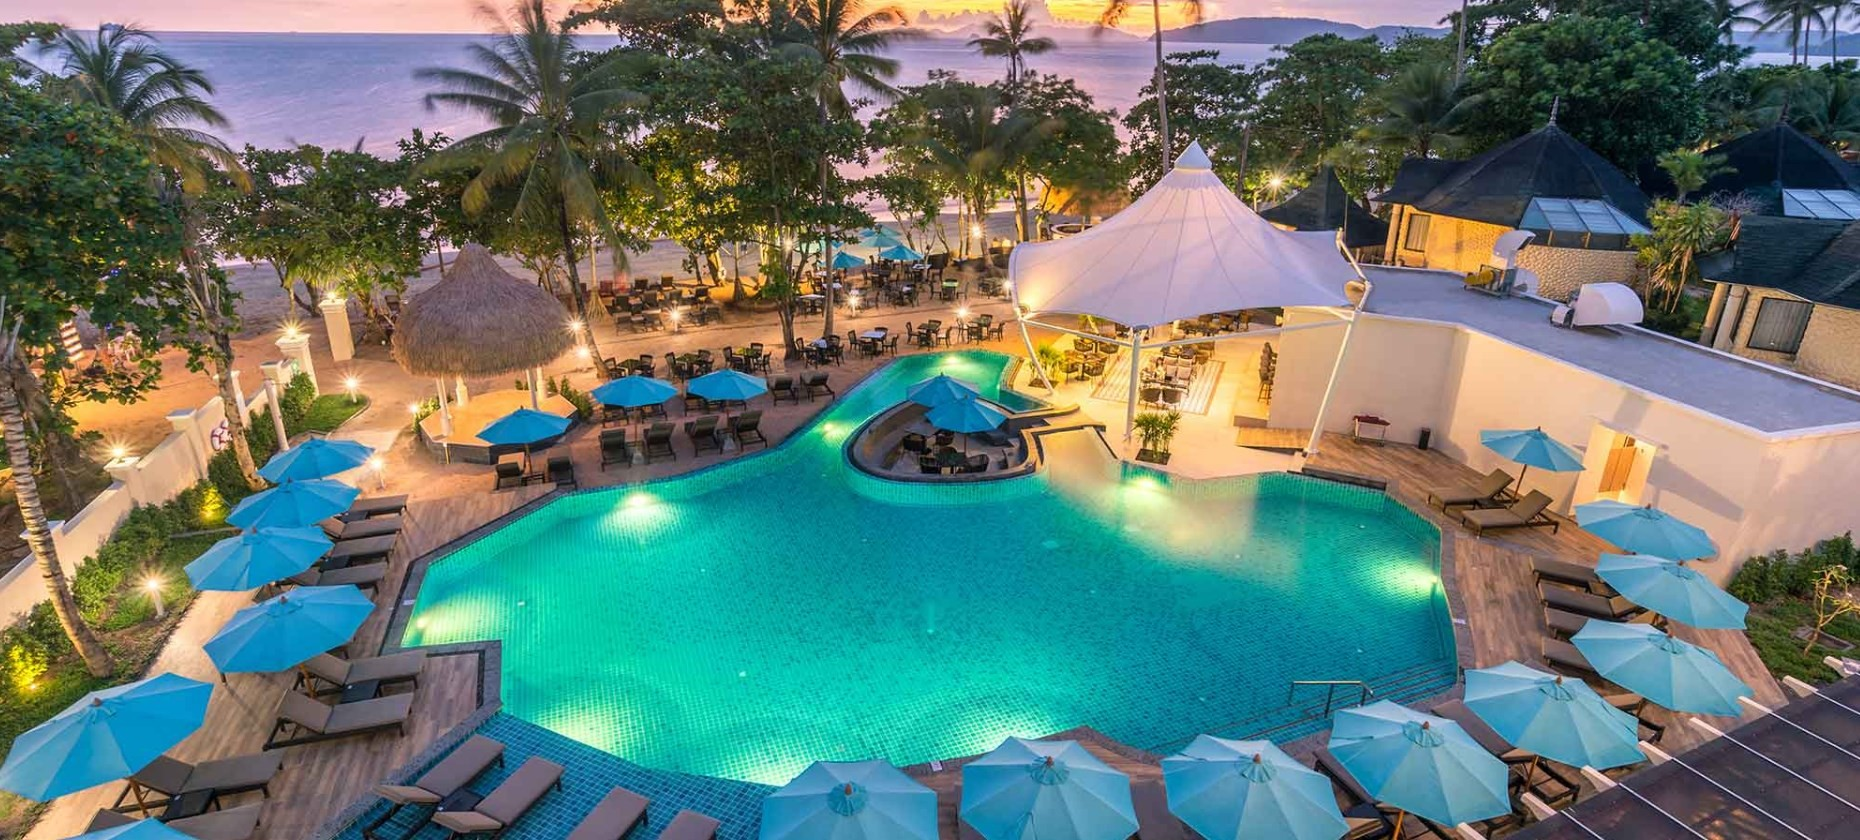 news-main-centara-ao-nang-beach-resort-spa-opens-in-krabi-thailand.1573729554.jpg